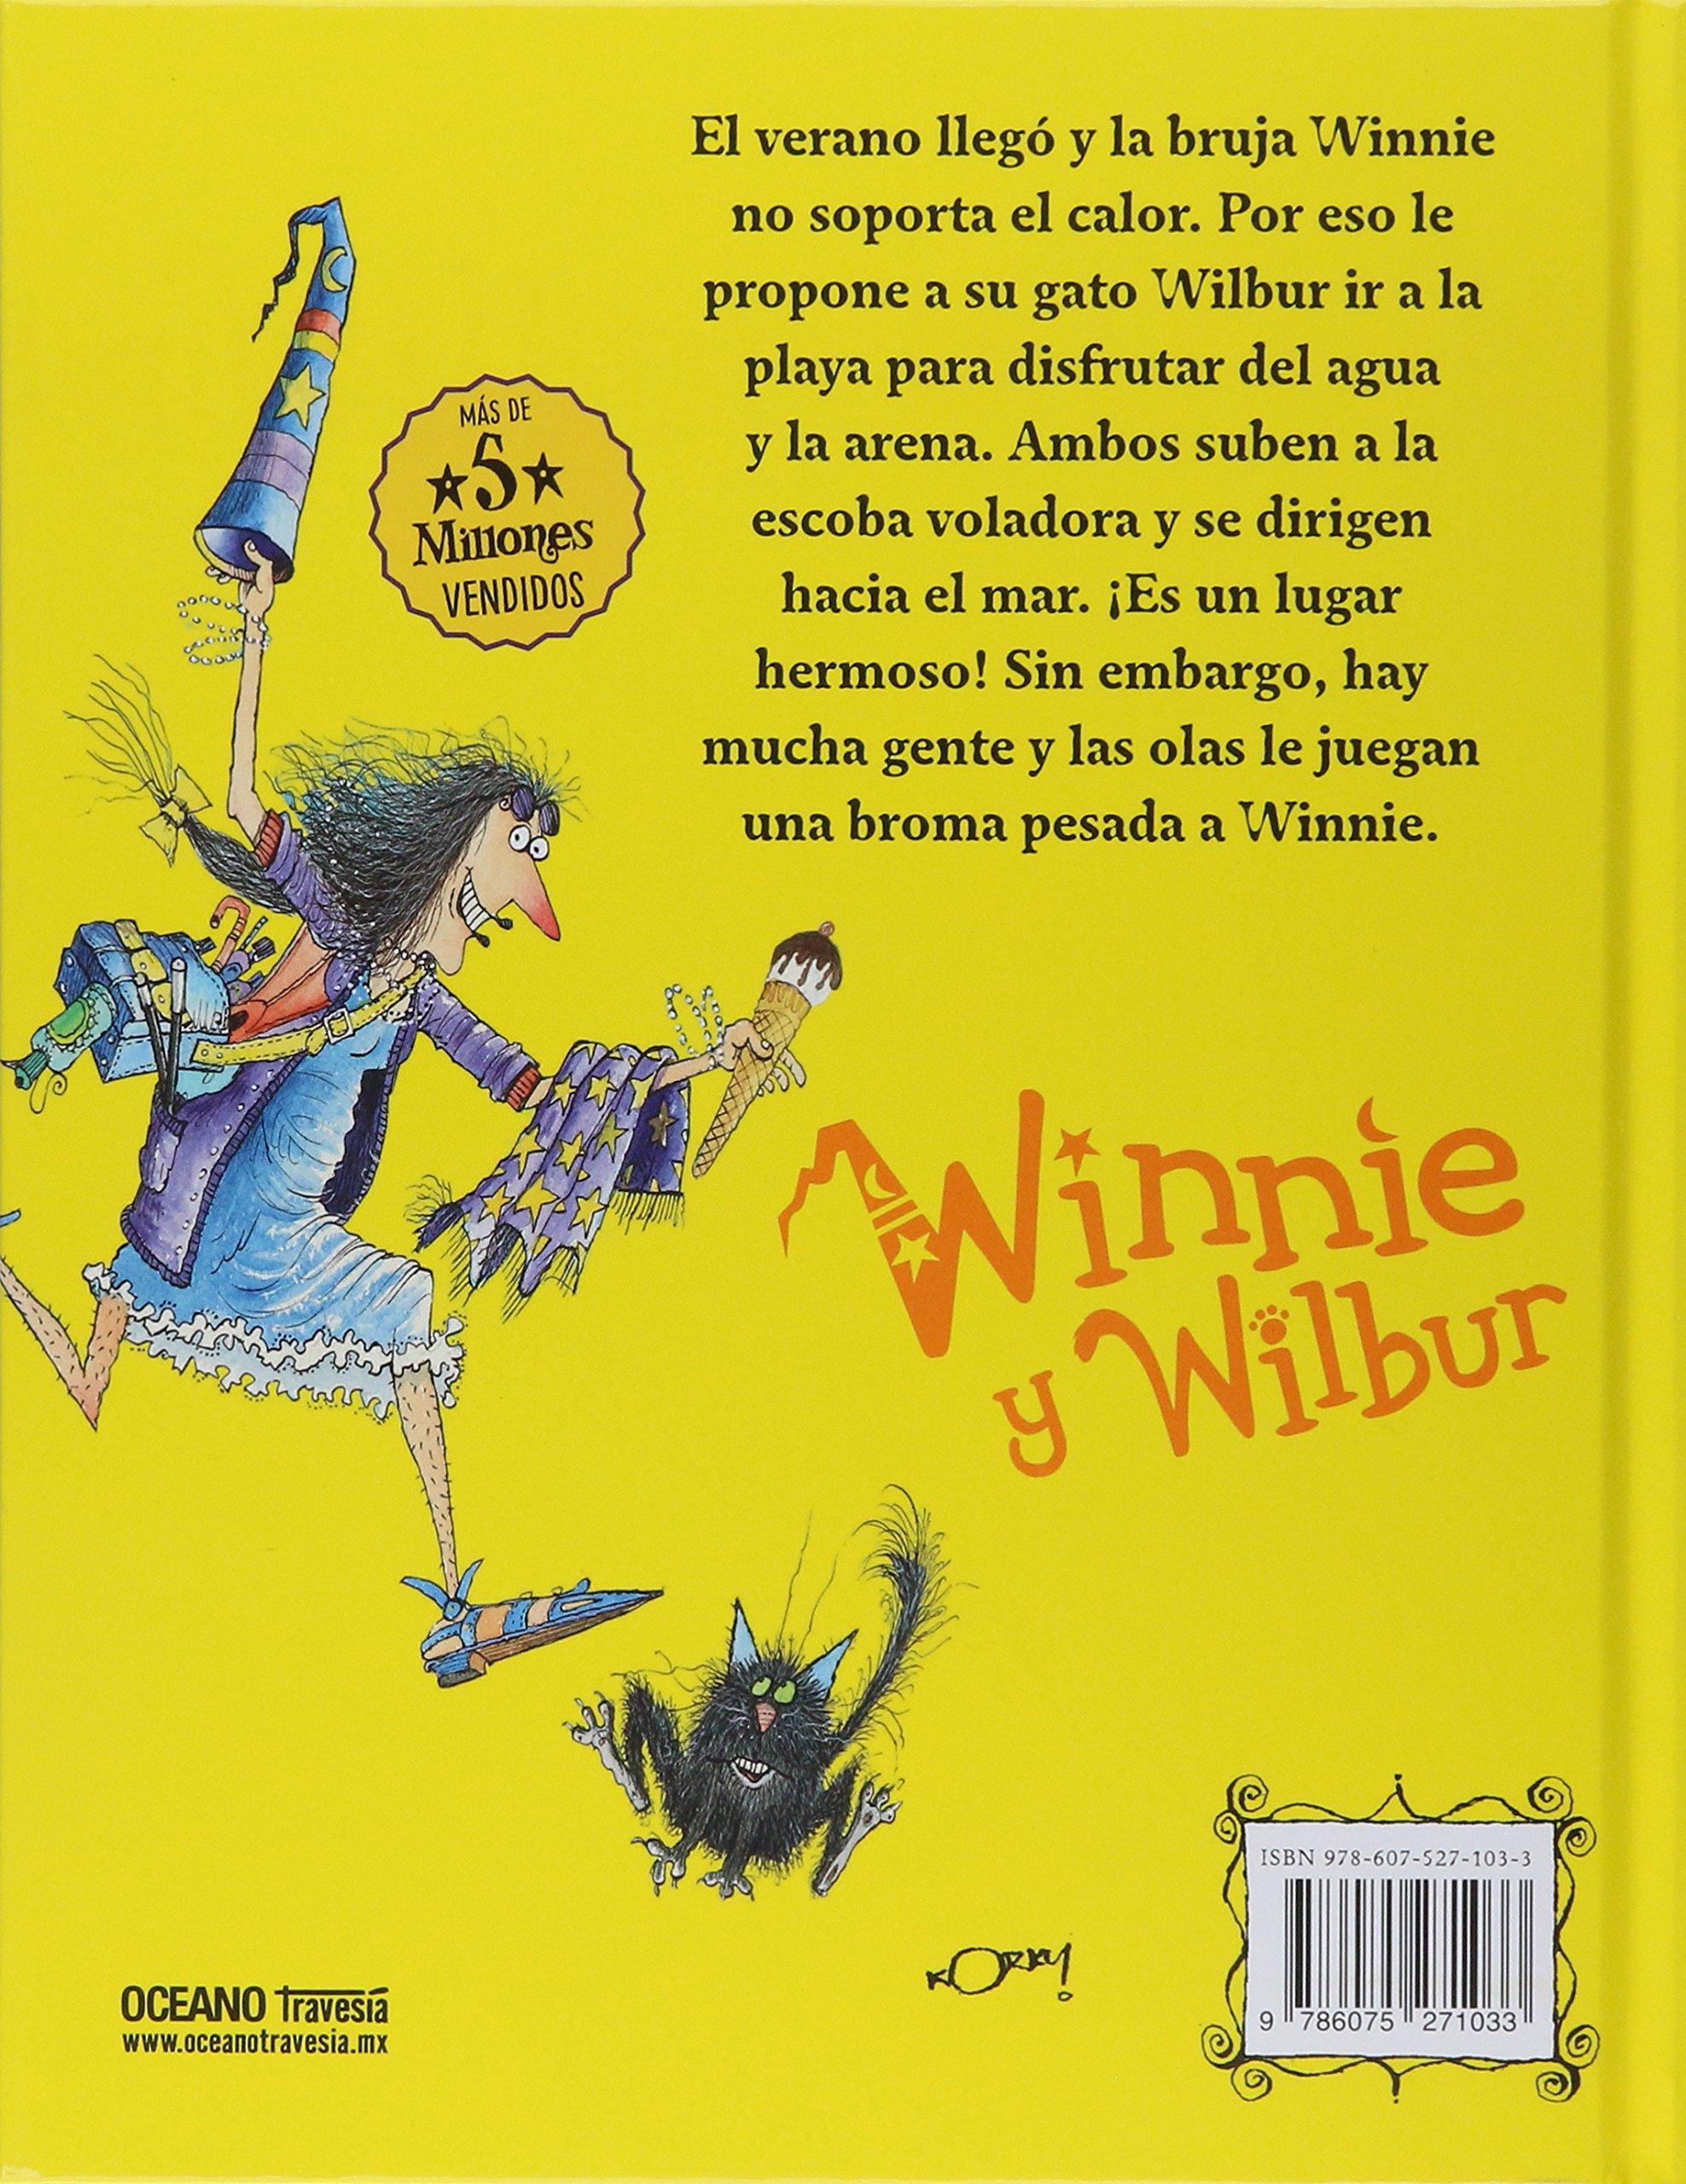 Winnie y Wilbur en la playa / Winnie at the Seaside (Spanish Edition): Valerie Thomas, Korky Paul: 9786075271033: Amazon.com: Books